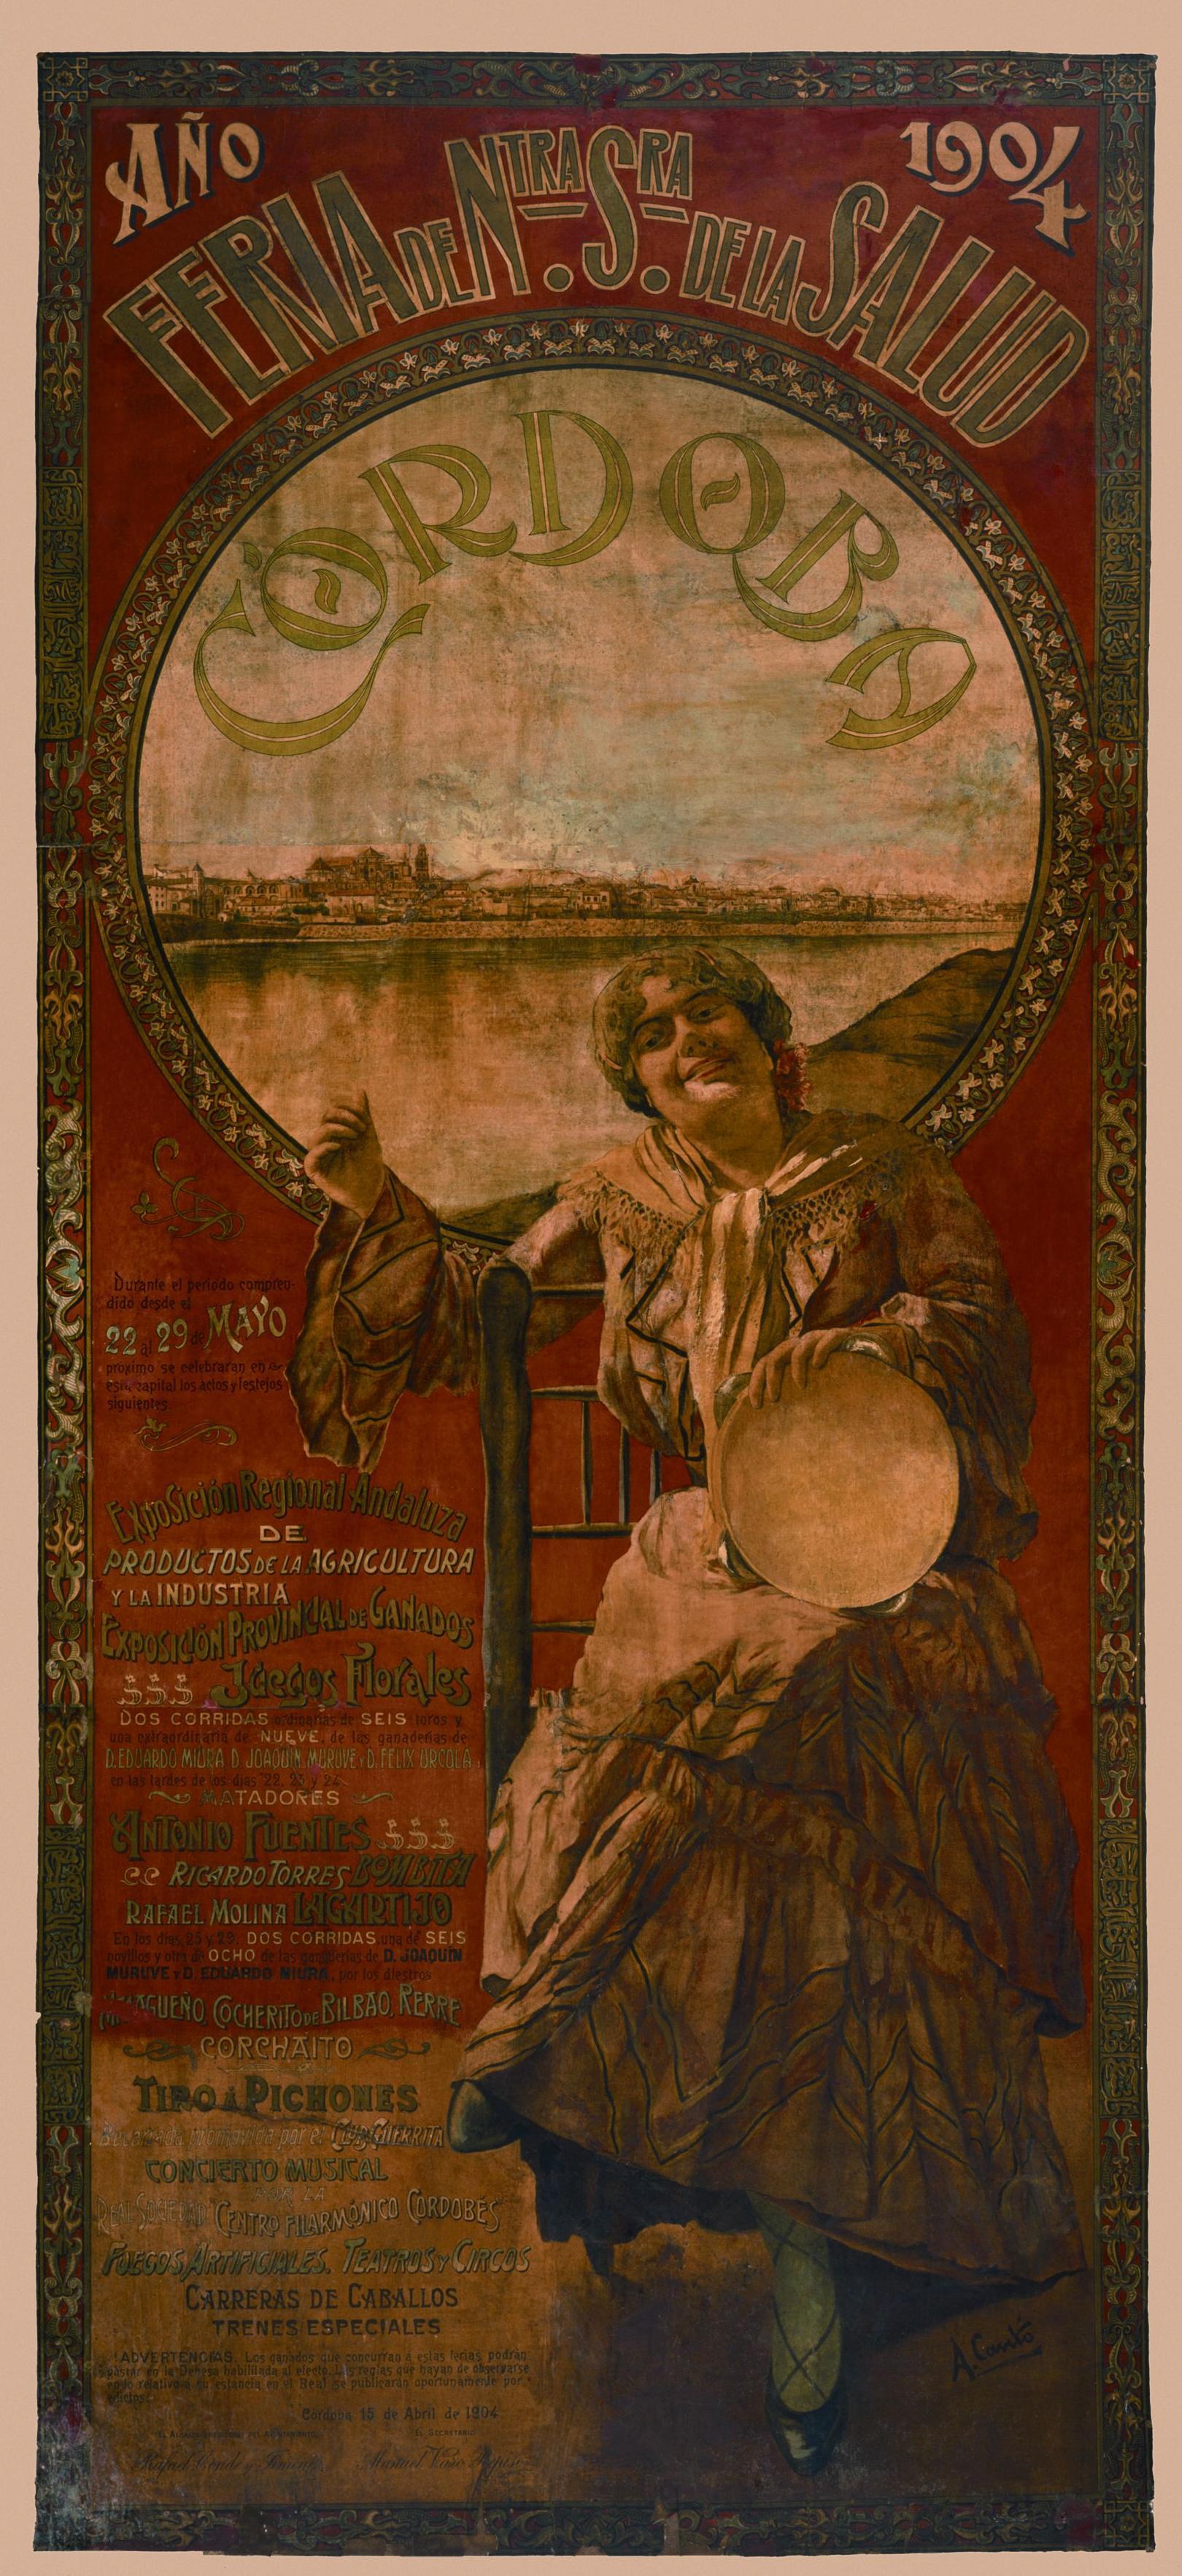 Cartel de la feria de Córdoba 1904